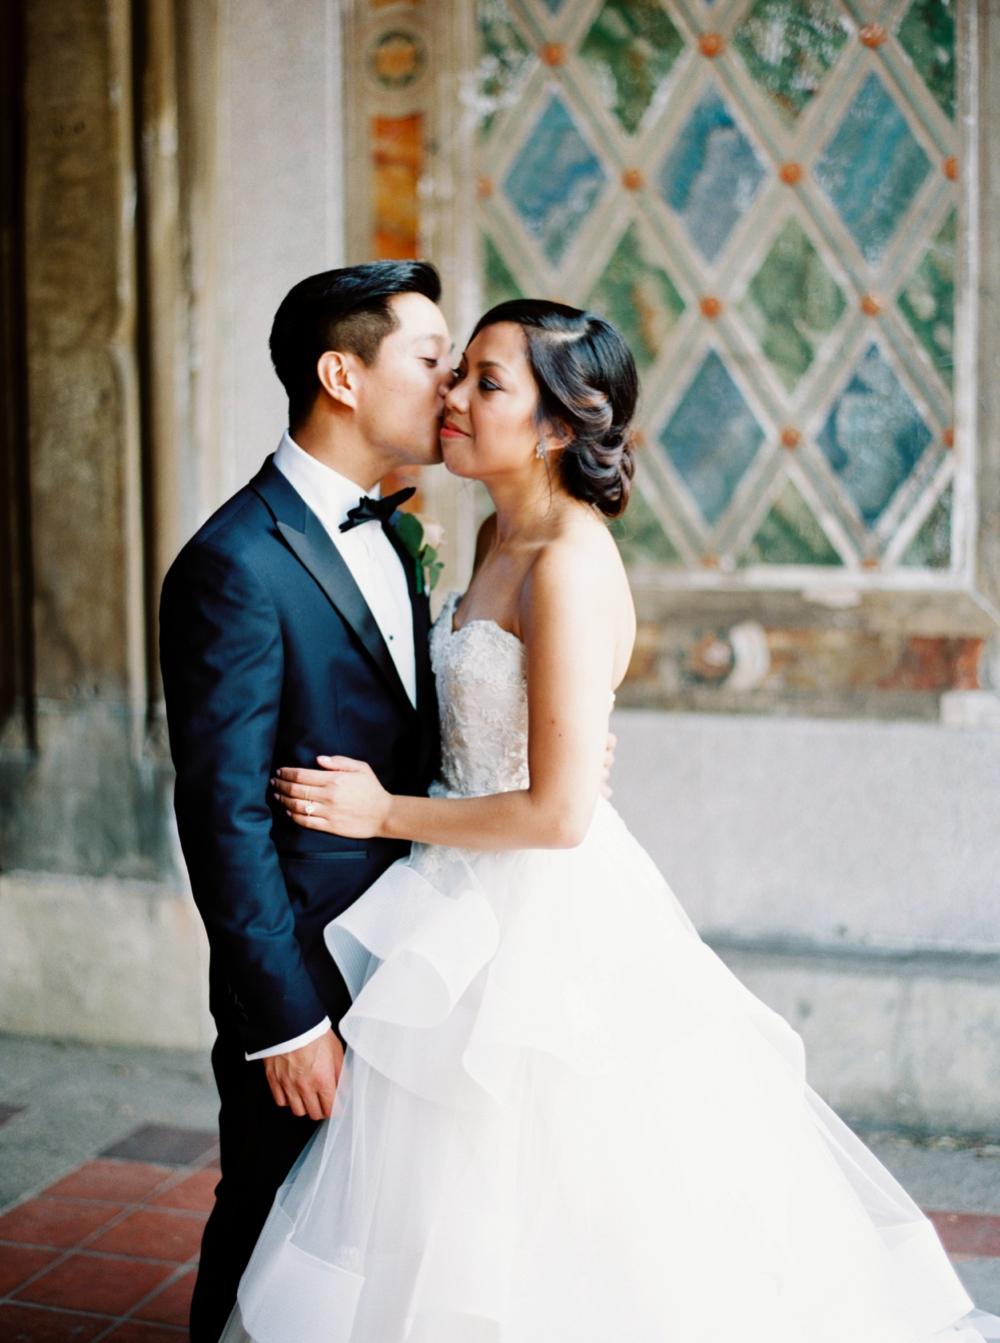 New York City Wedding | The Boat House Wedding Reception | Central Park Wedding Photographer | Calgary Wedding Photographers | Church Wedding